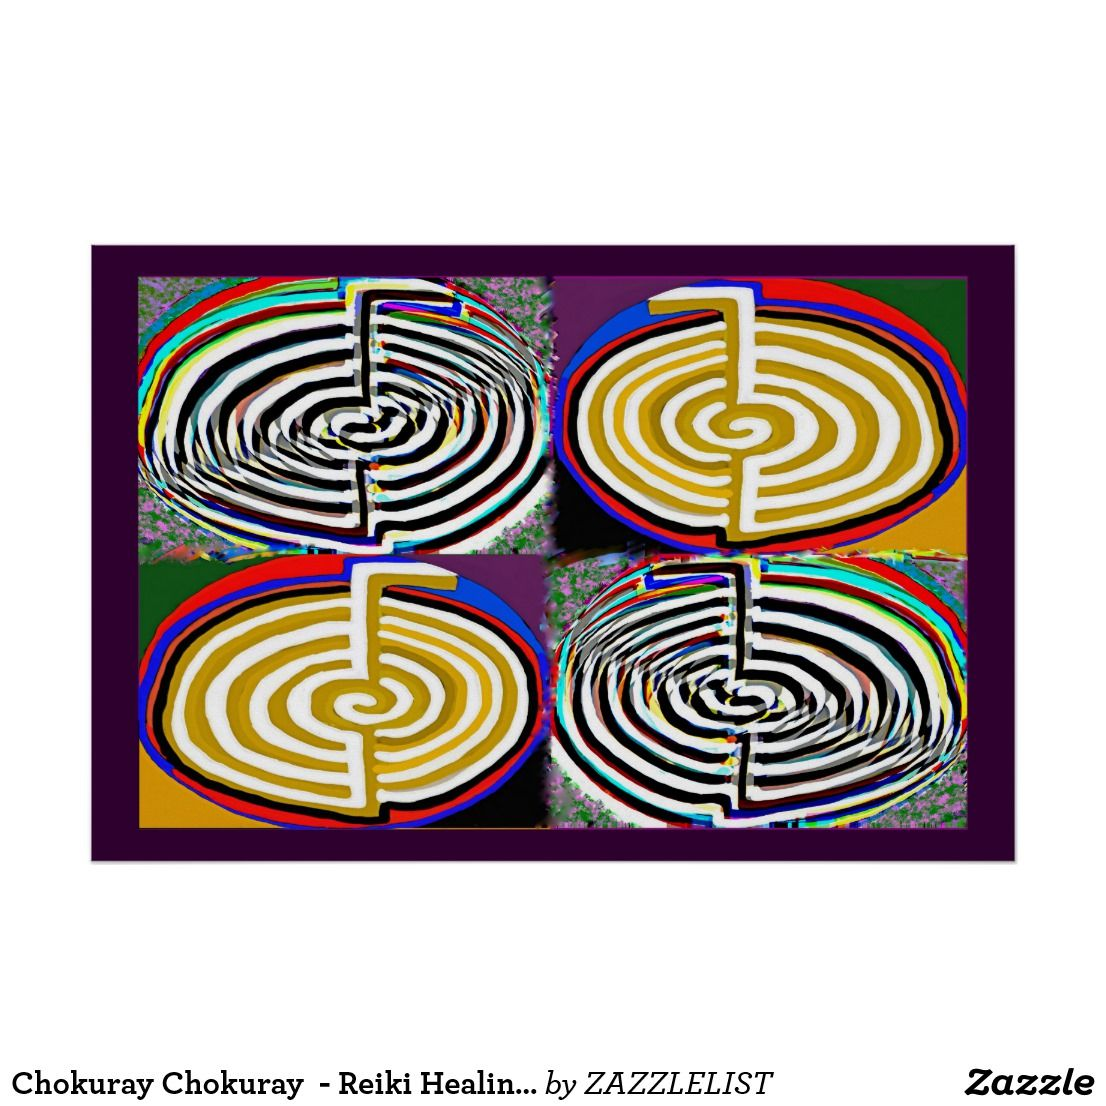 Chokuray chokuray reiki healing symbol poster 101 zazzle pro chokuray chokuray reiki healing symbol poster biocorpaavc